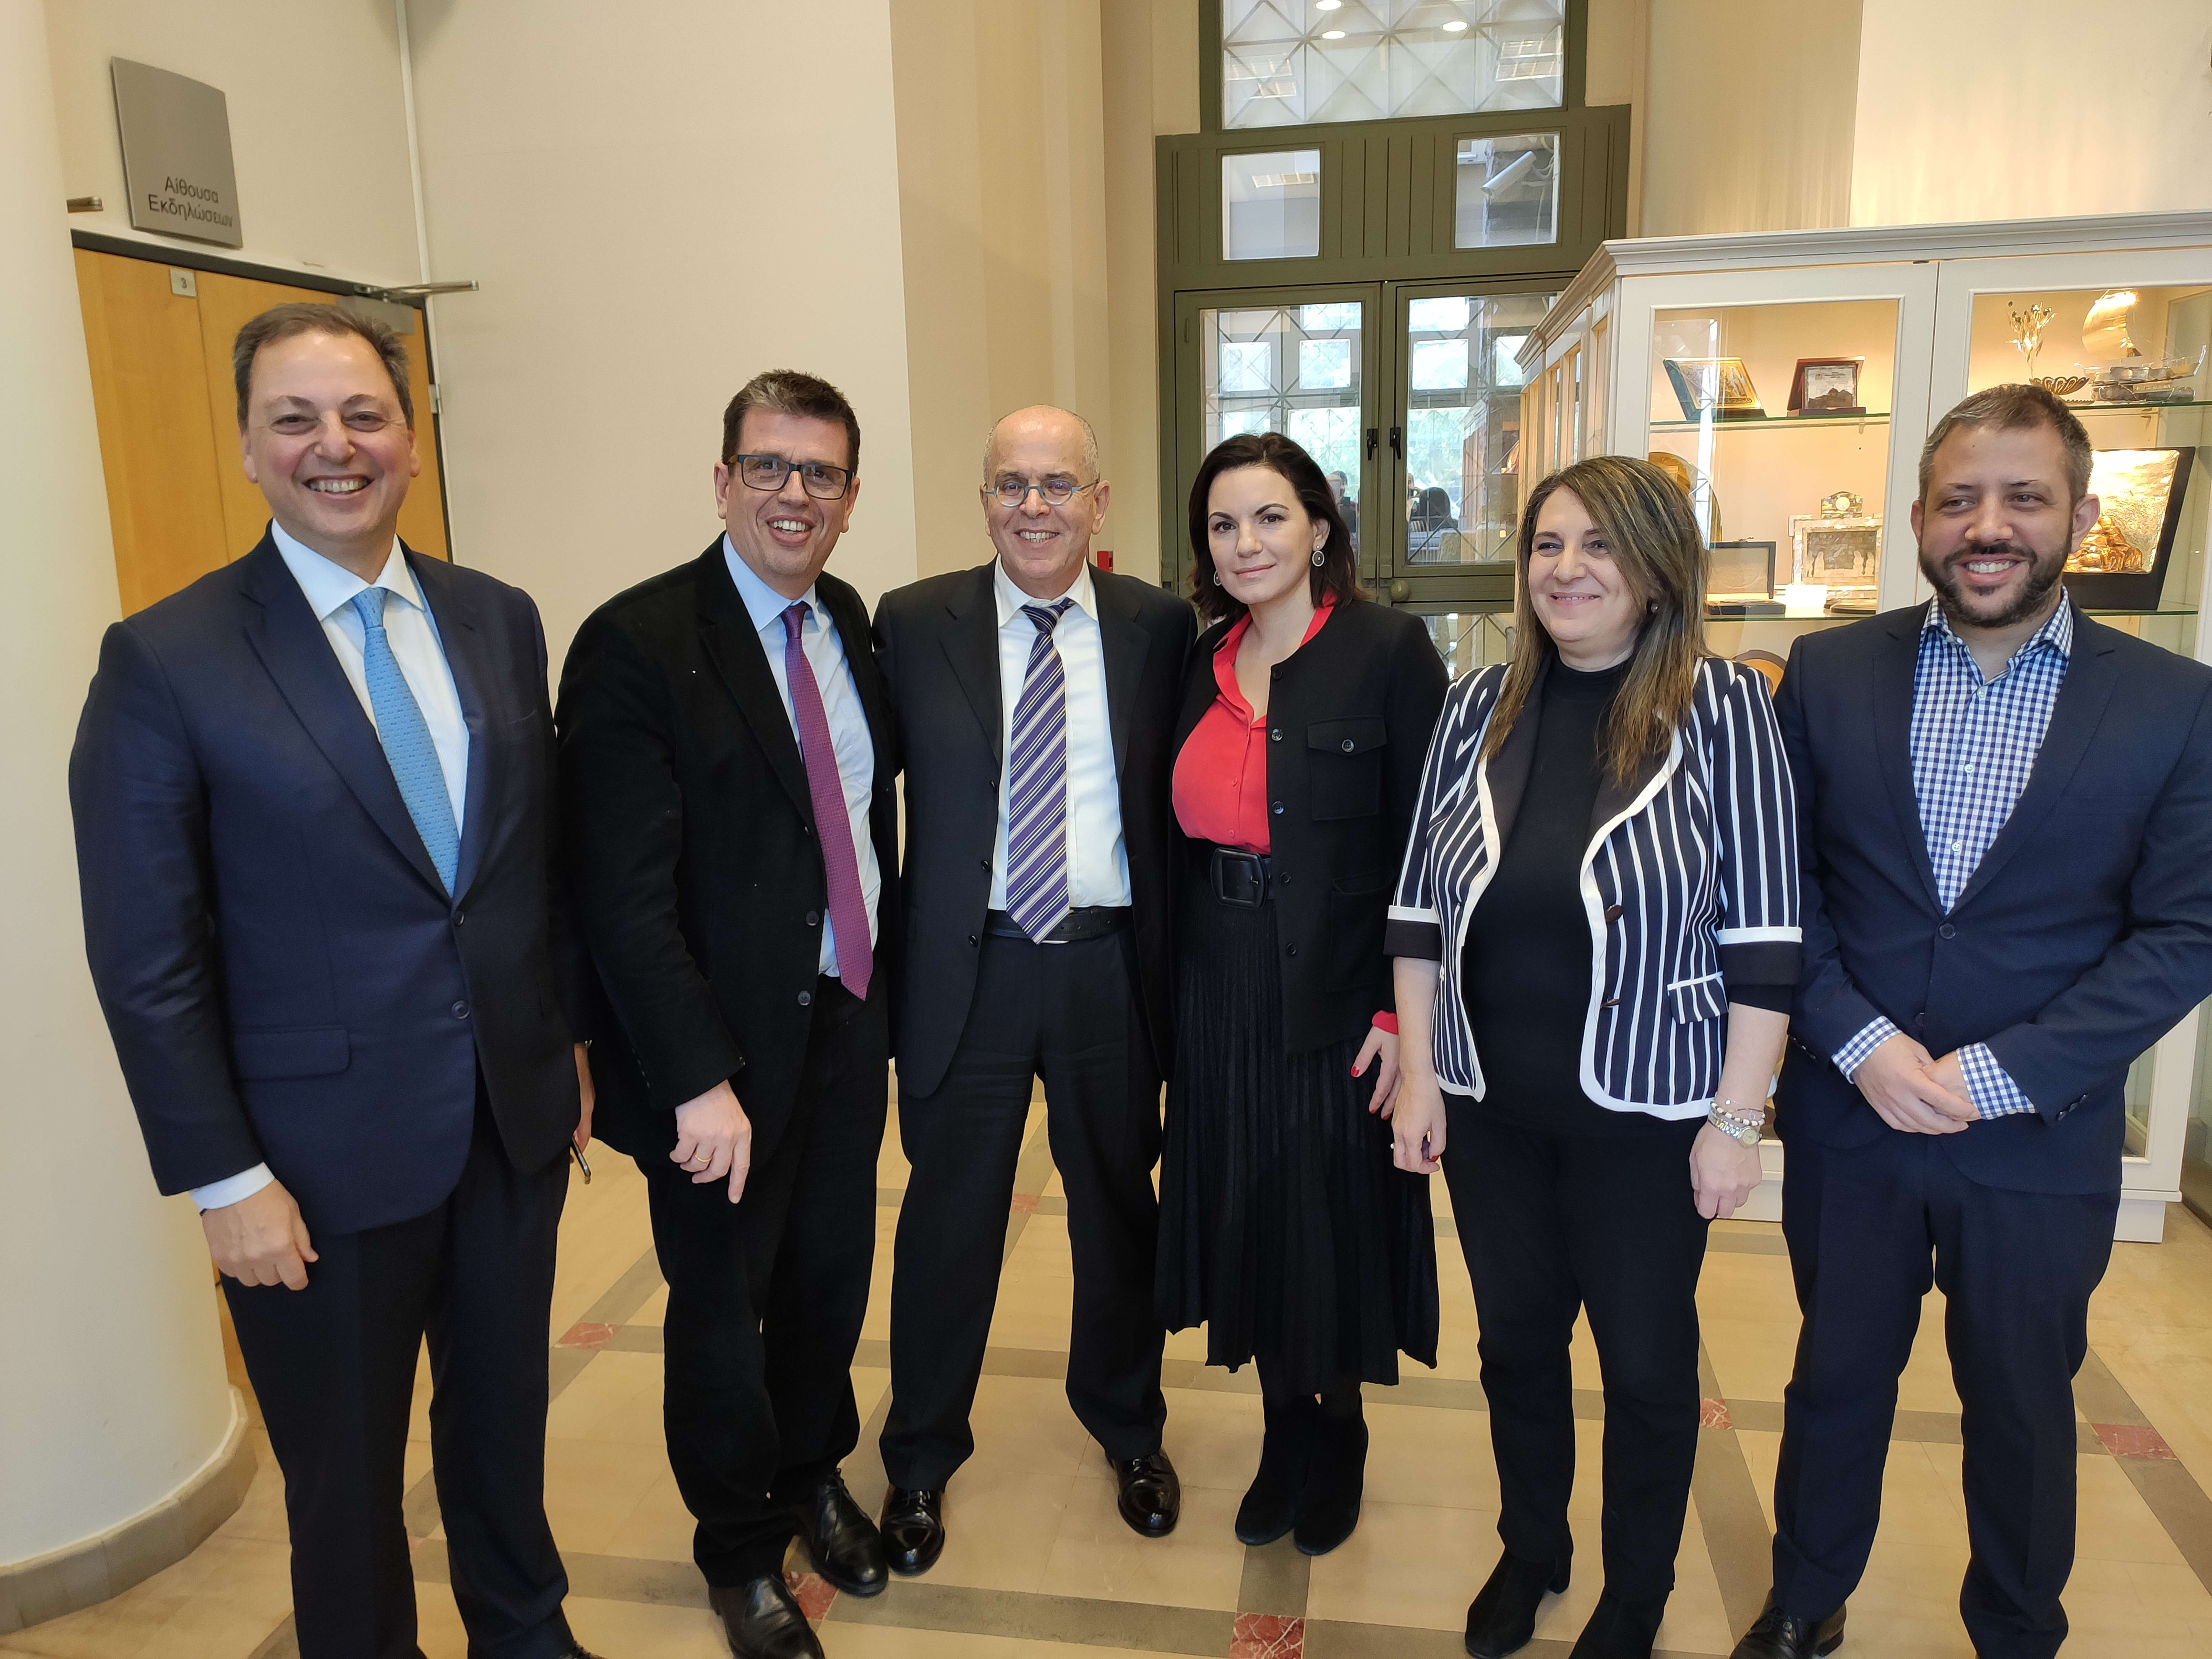 H ελληνο-ισραηλινή συμμαχία ανάχωμα στον τουρκικό επεκτατισμό (ΚΟΦ Ελλάδας-Ισραήλ, 26.02.2020)